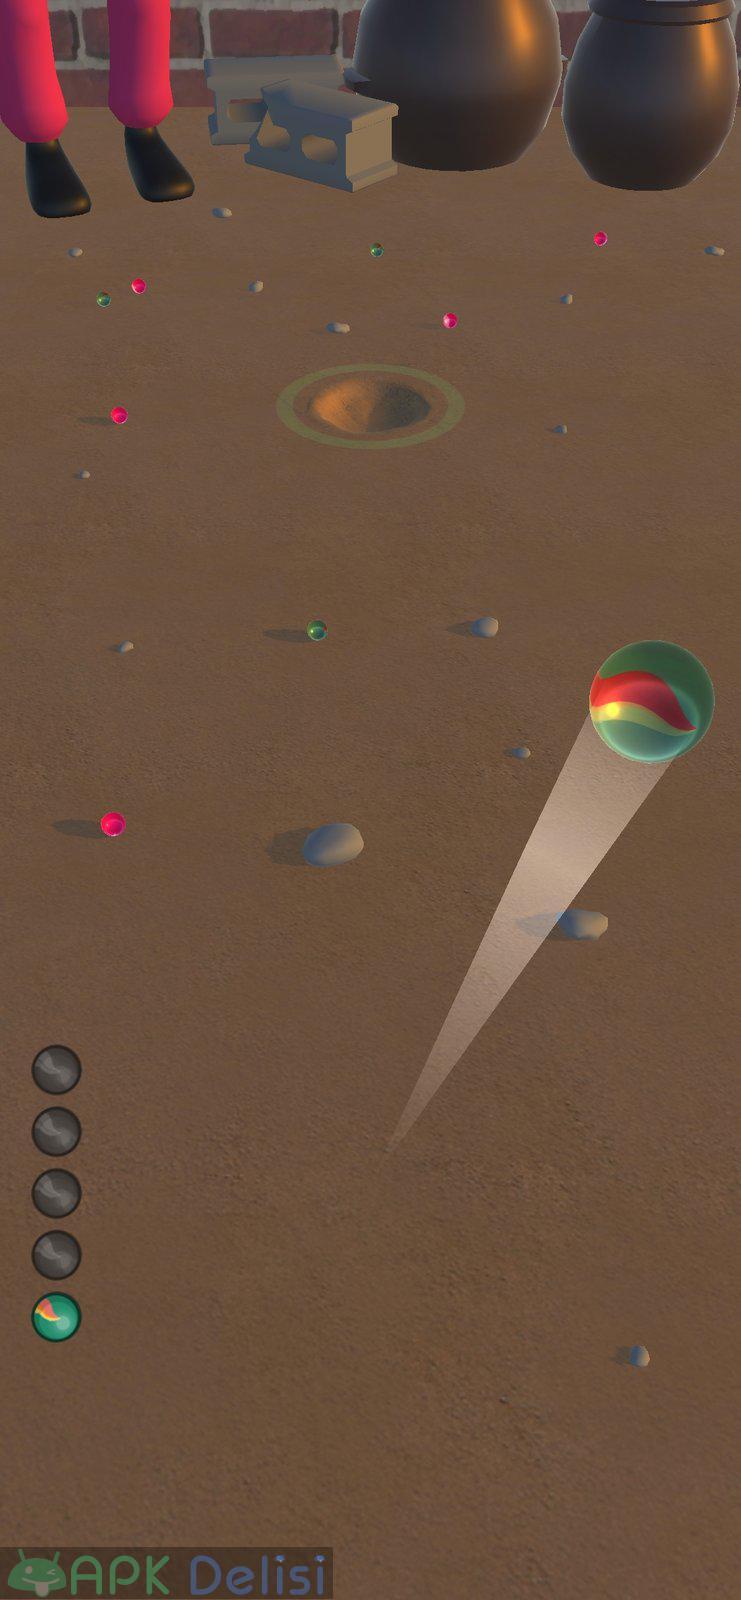 Squid Game v1.0.37 APK — TAM SÜRÜM 4